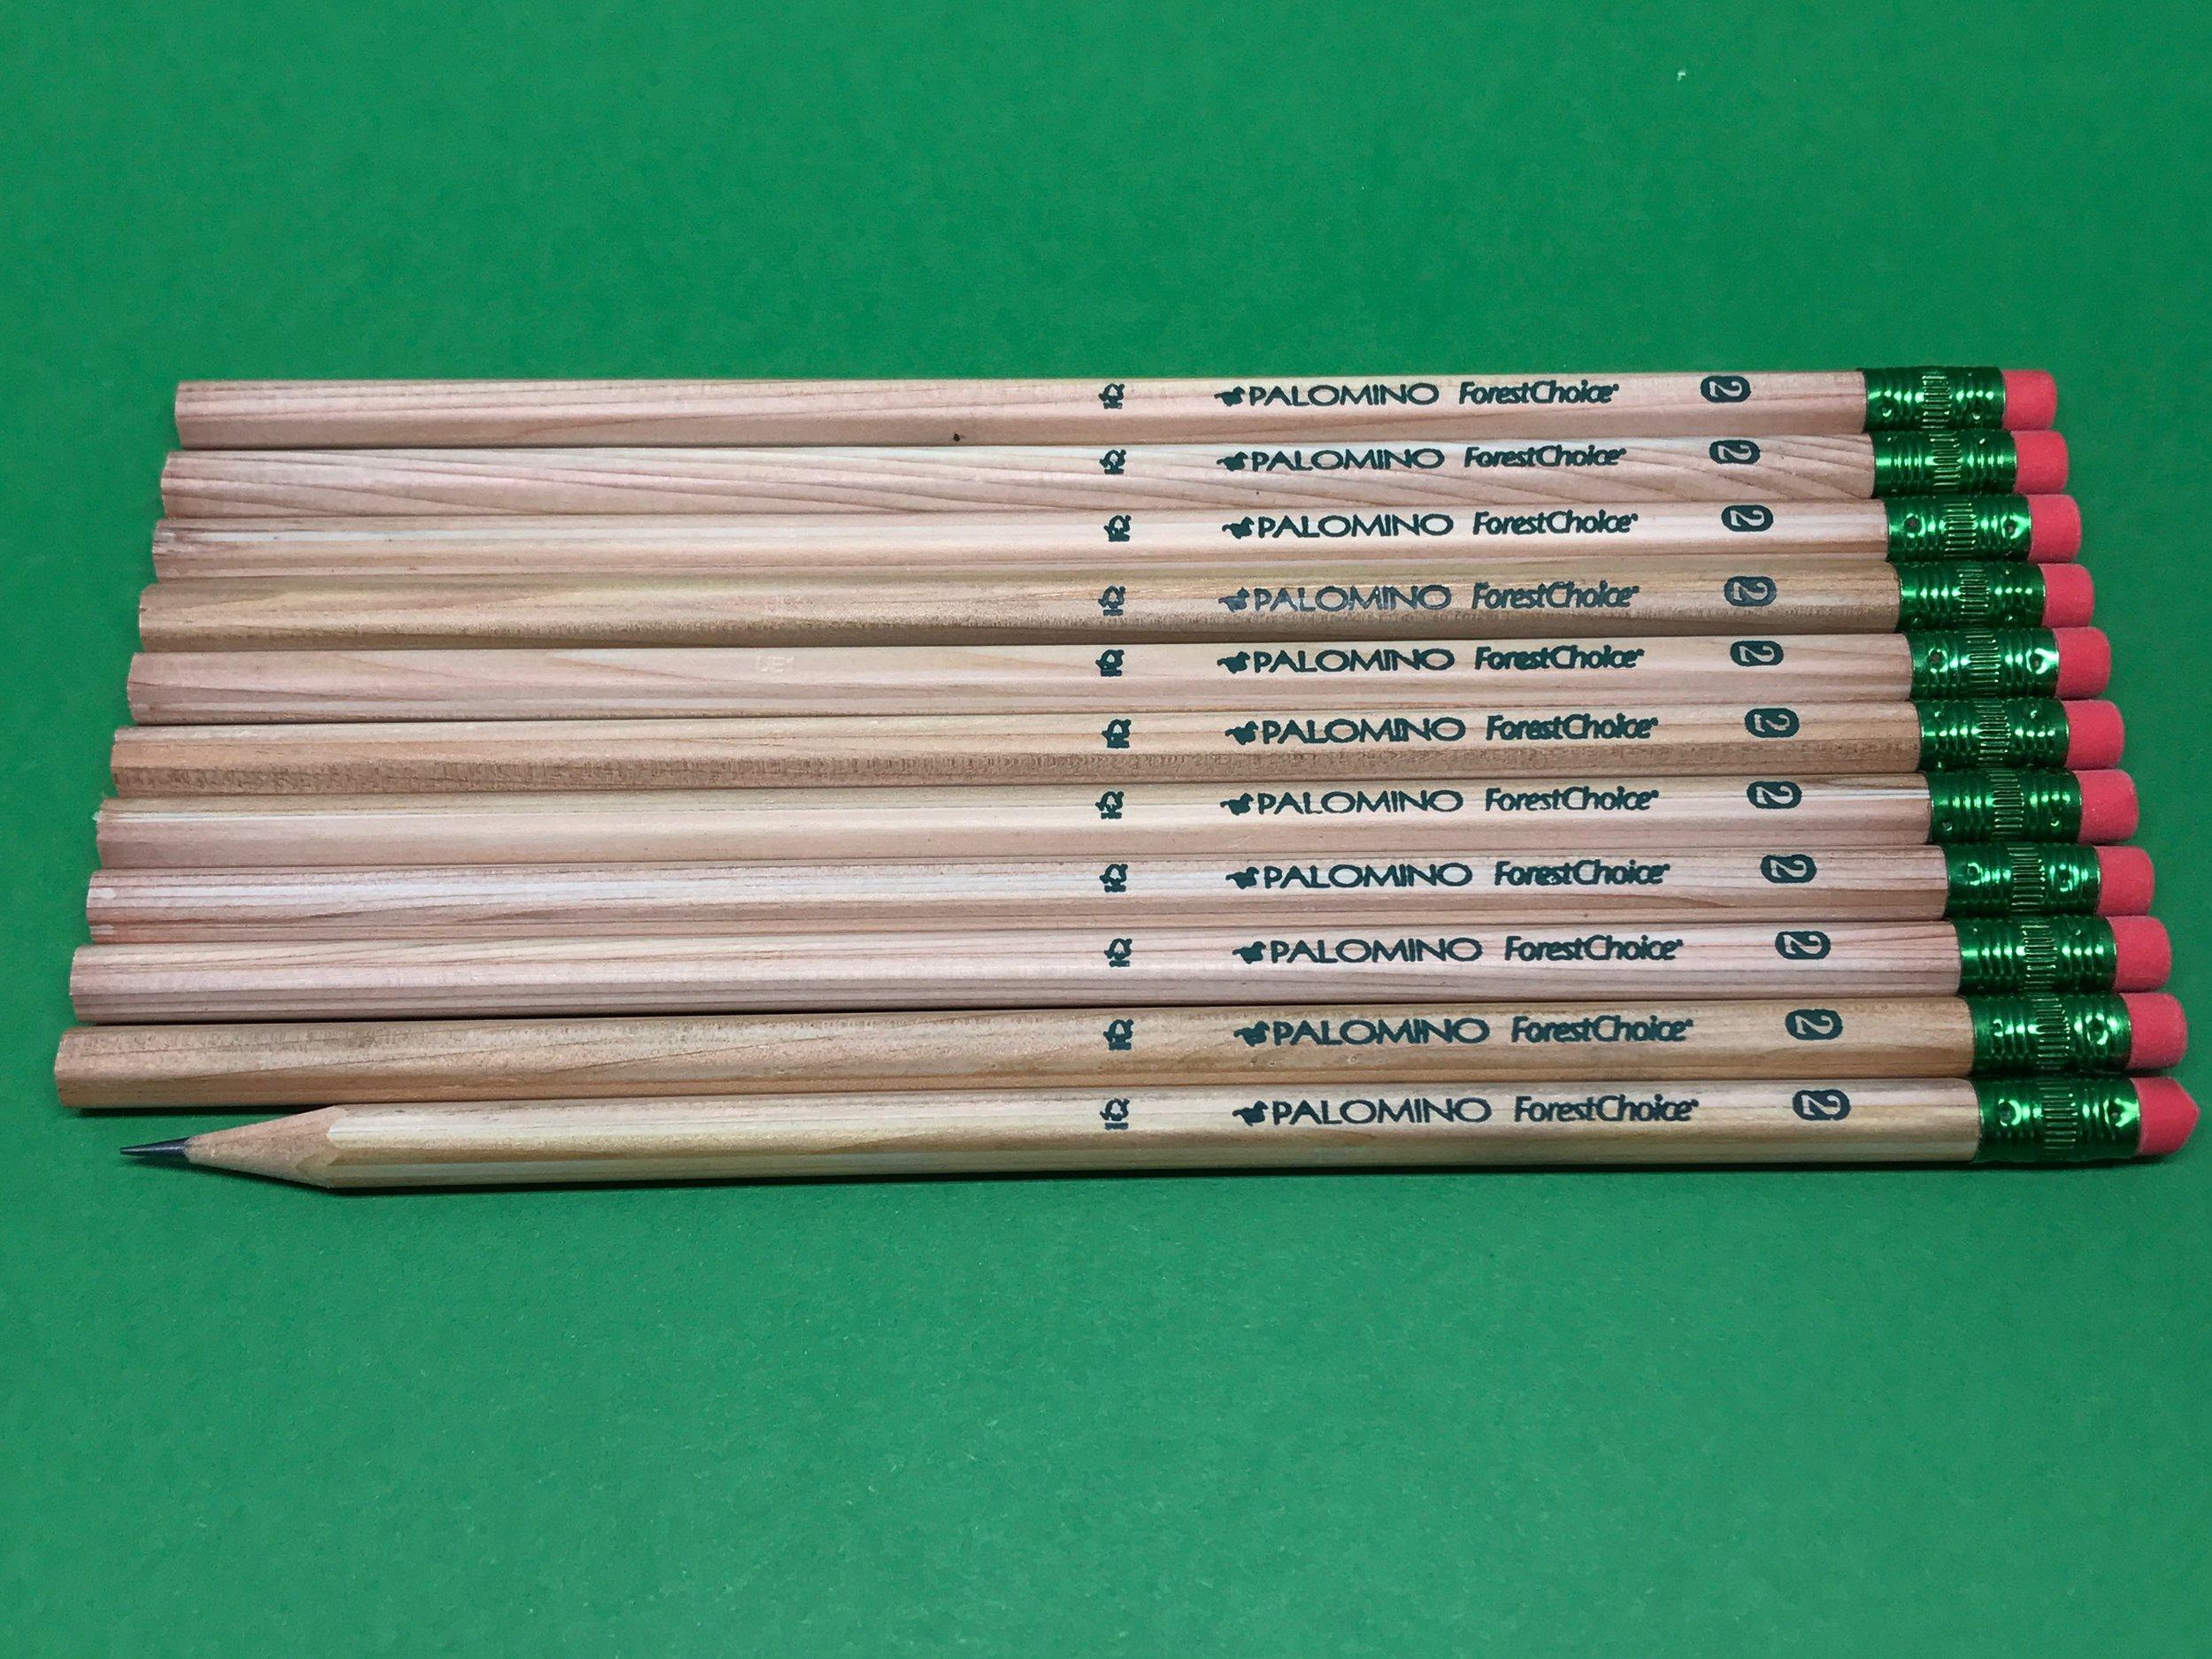 palomino-forest-choice-pencil-2.jpg